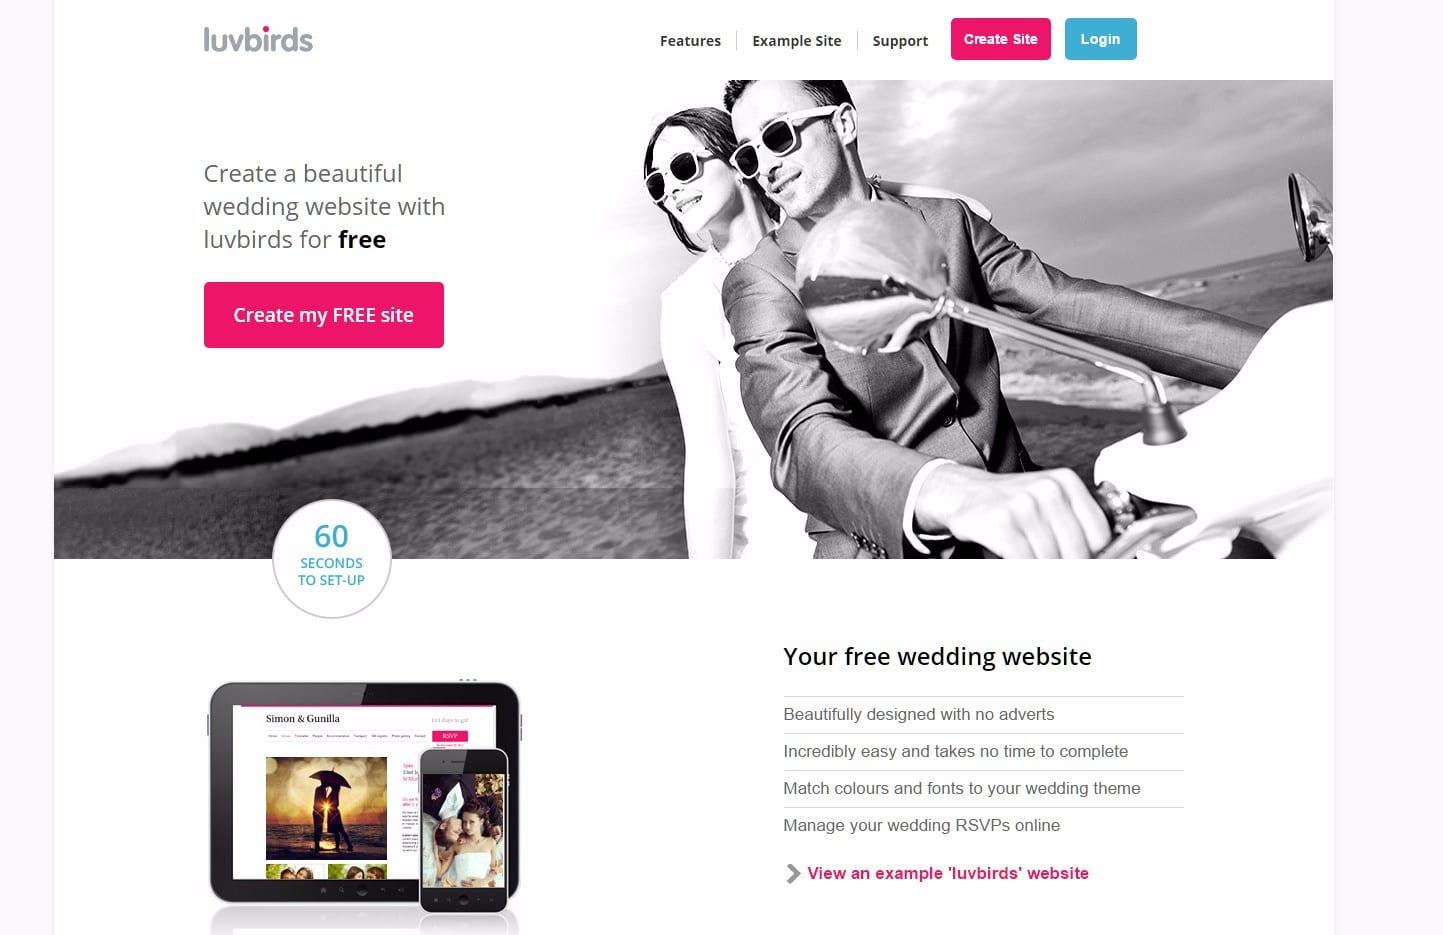 Luvbirds Beautiful Wedding Website Builder Google Chrome 4282017 83827 Pm Bmp